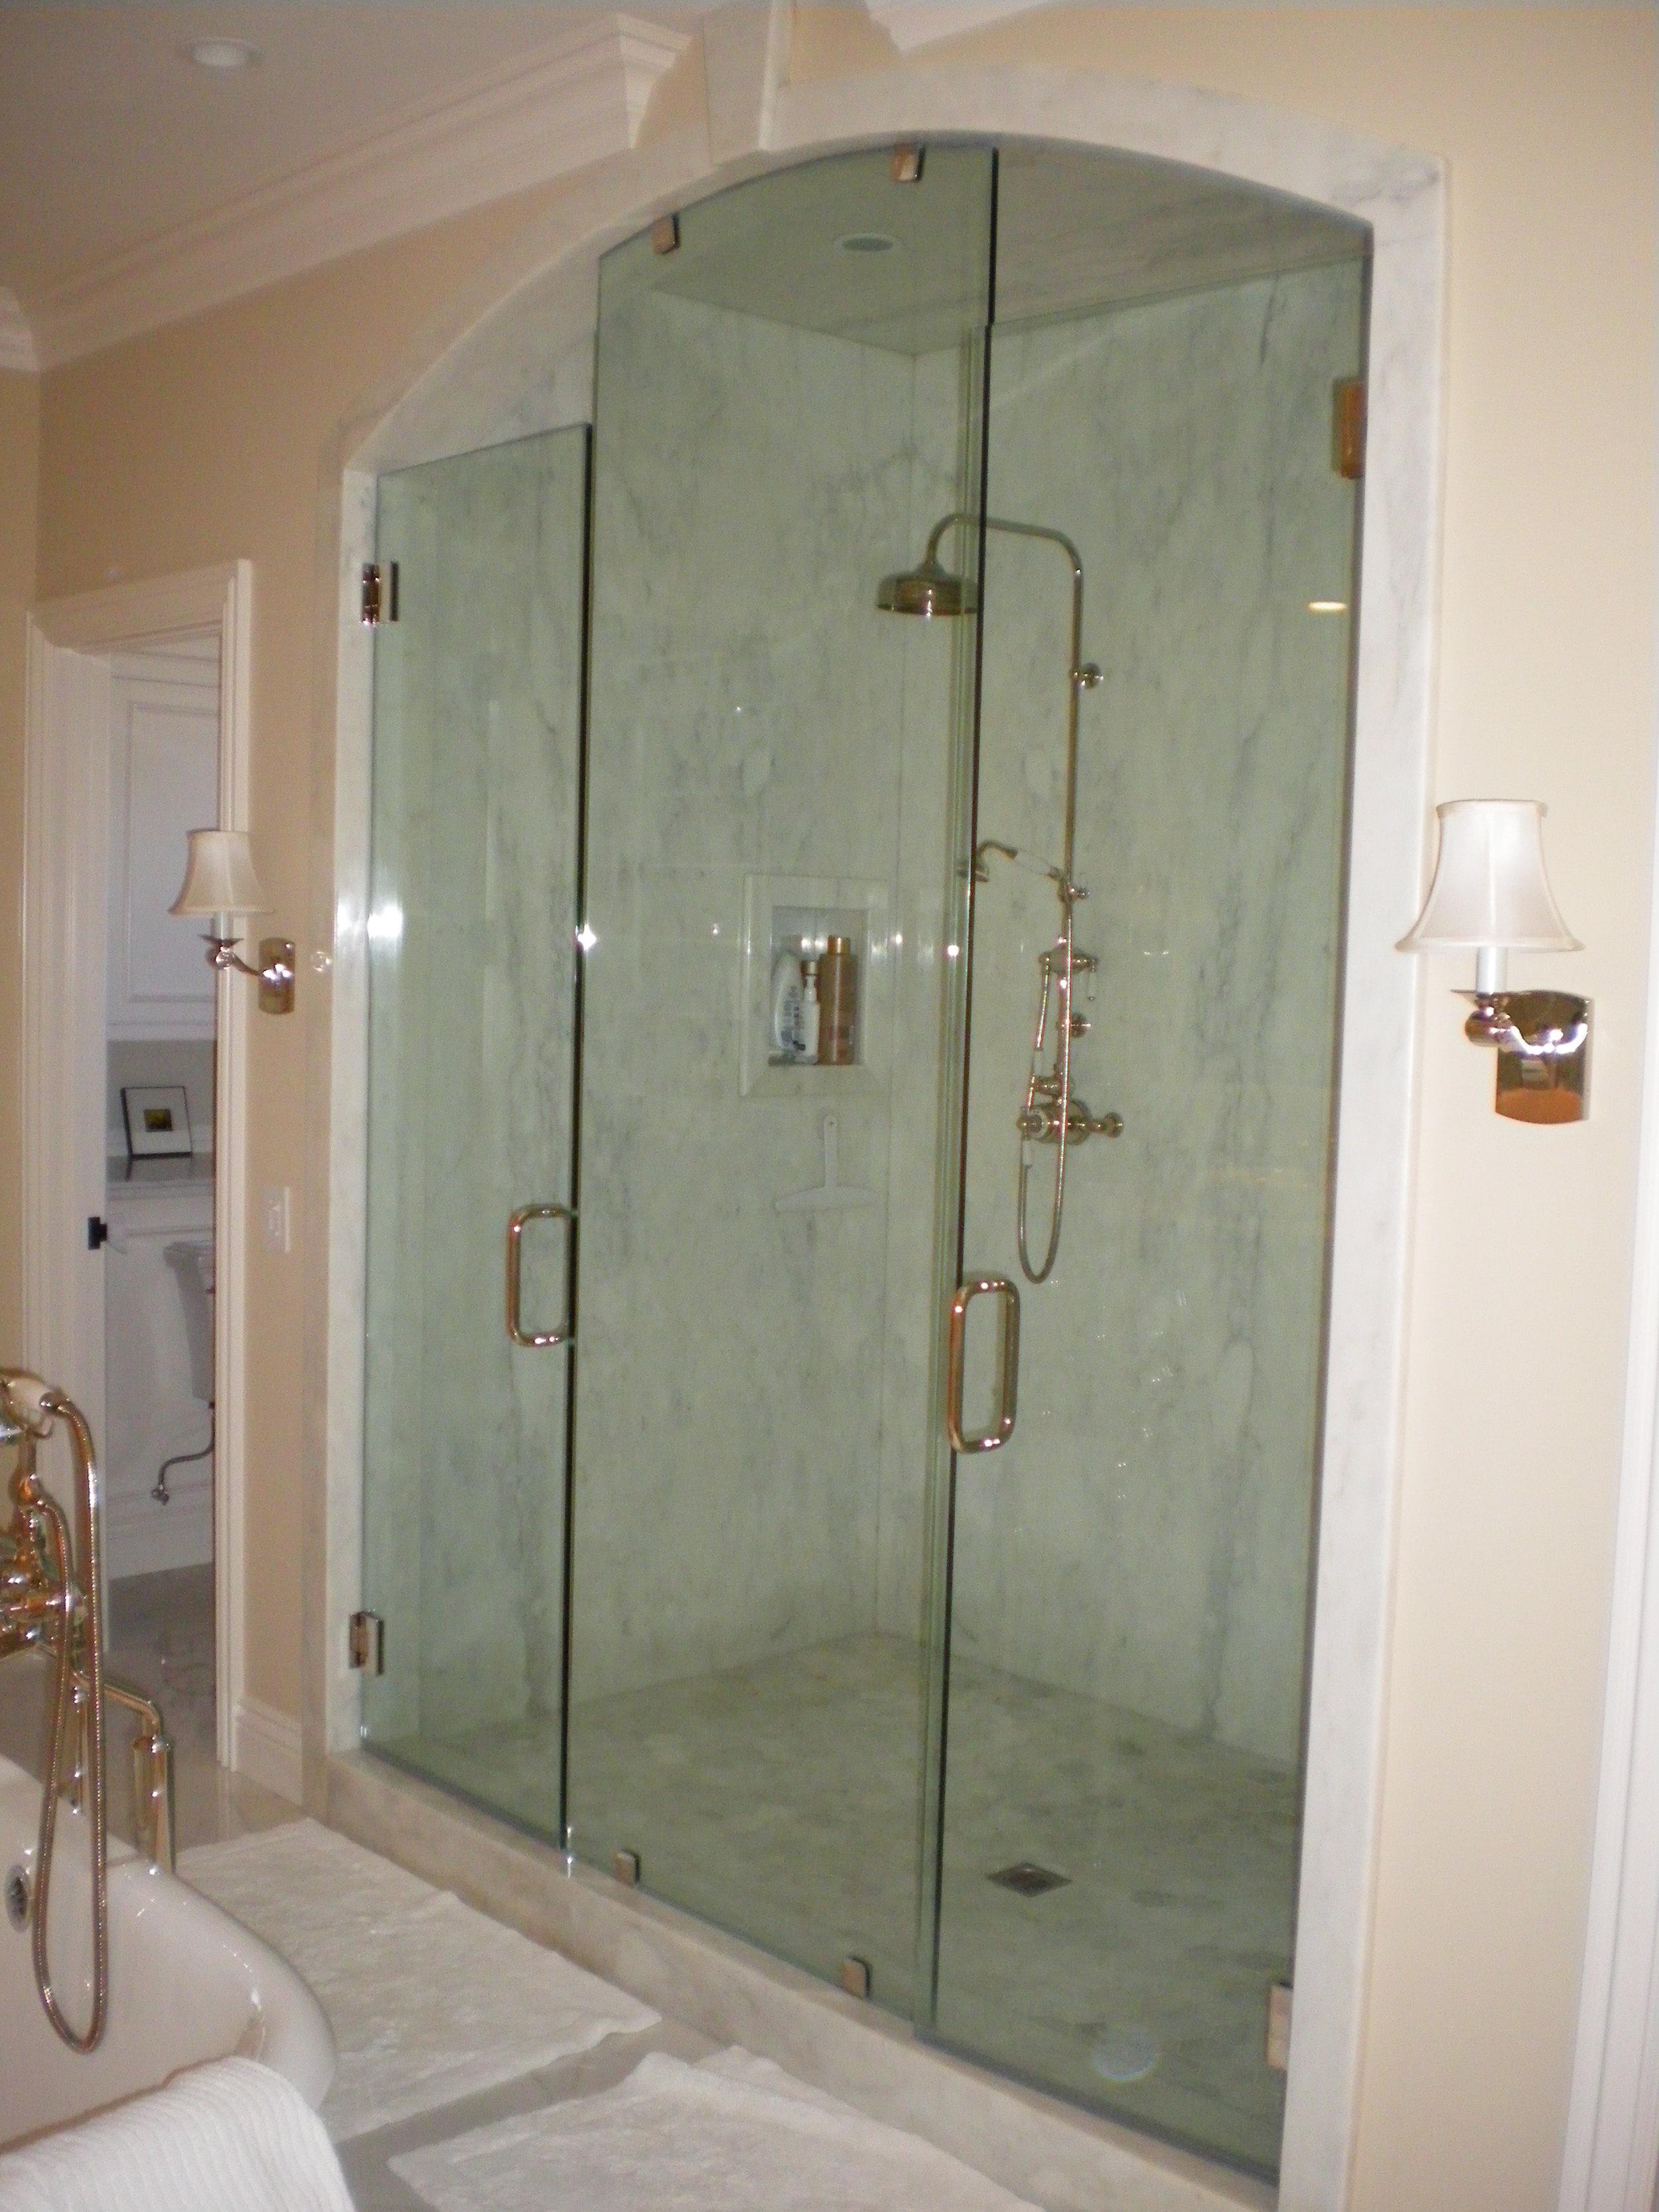 Shower-Doors-Residential-Photos-26.jpg